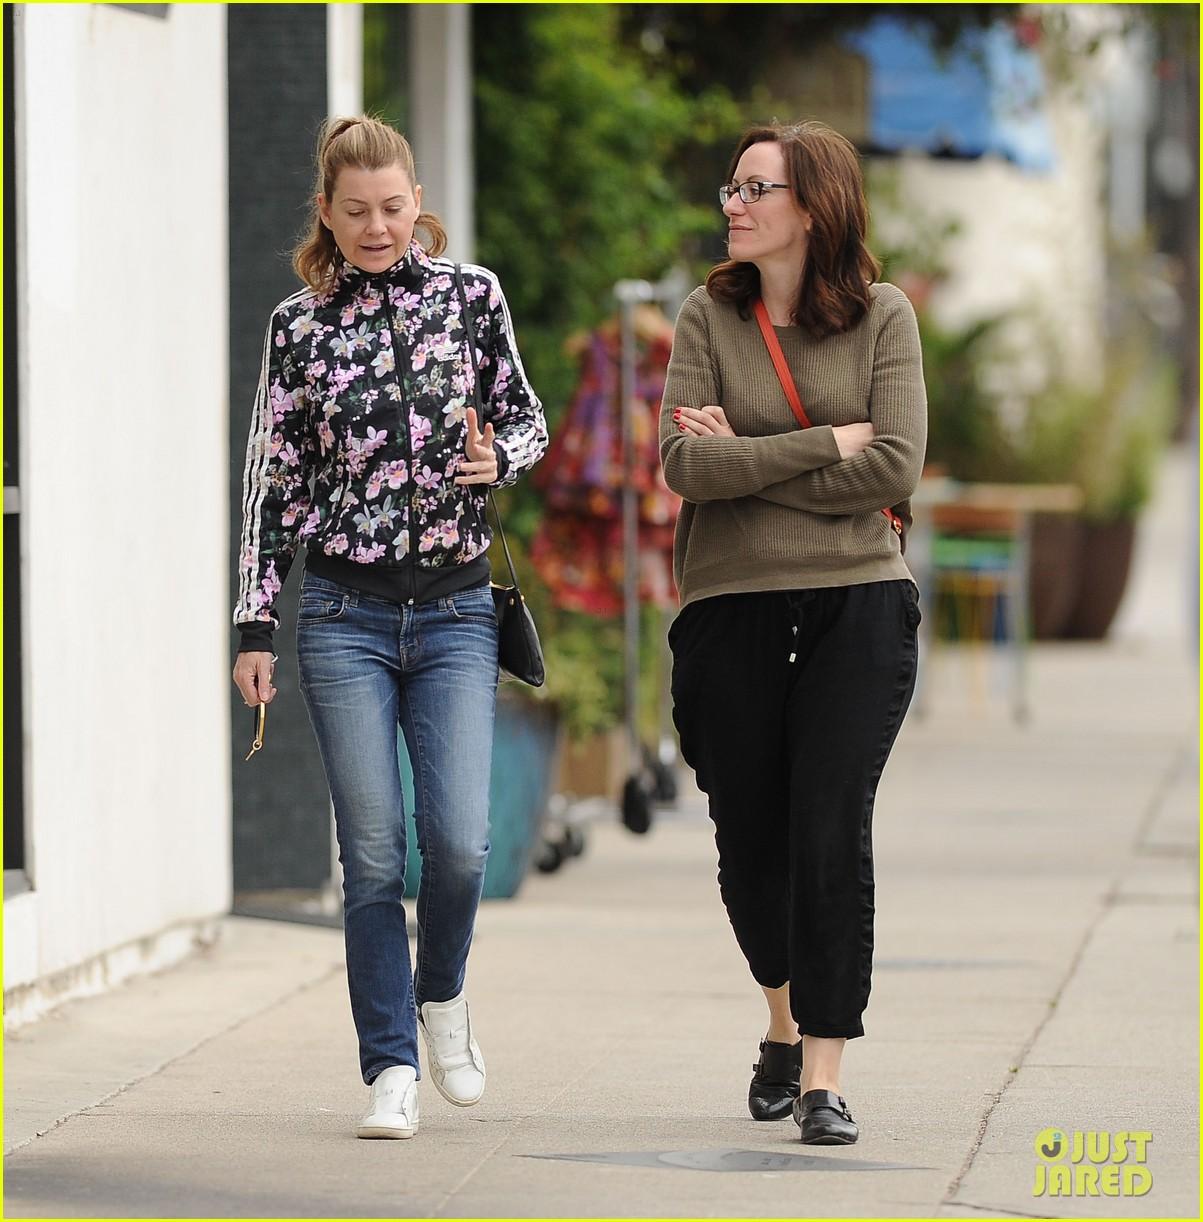 9f5c8de2889a7 Ellen Pompeo Had Reservations About Meredith Grey's Brutal Attack on ...